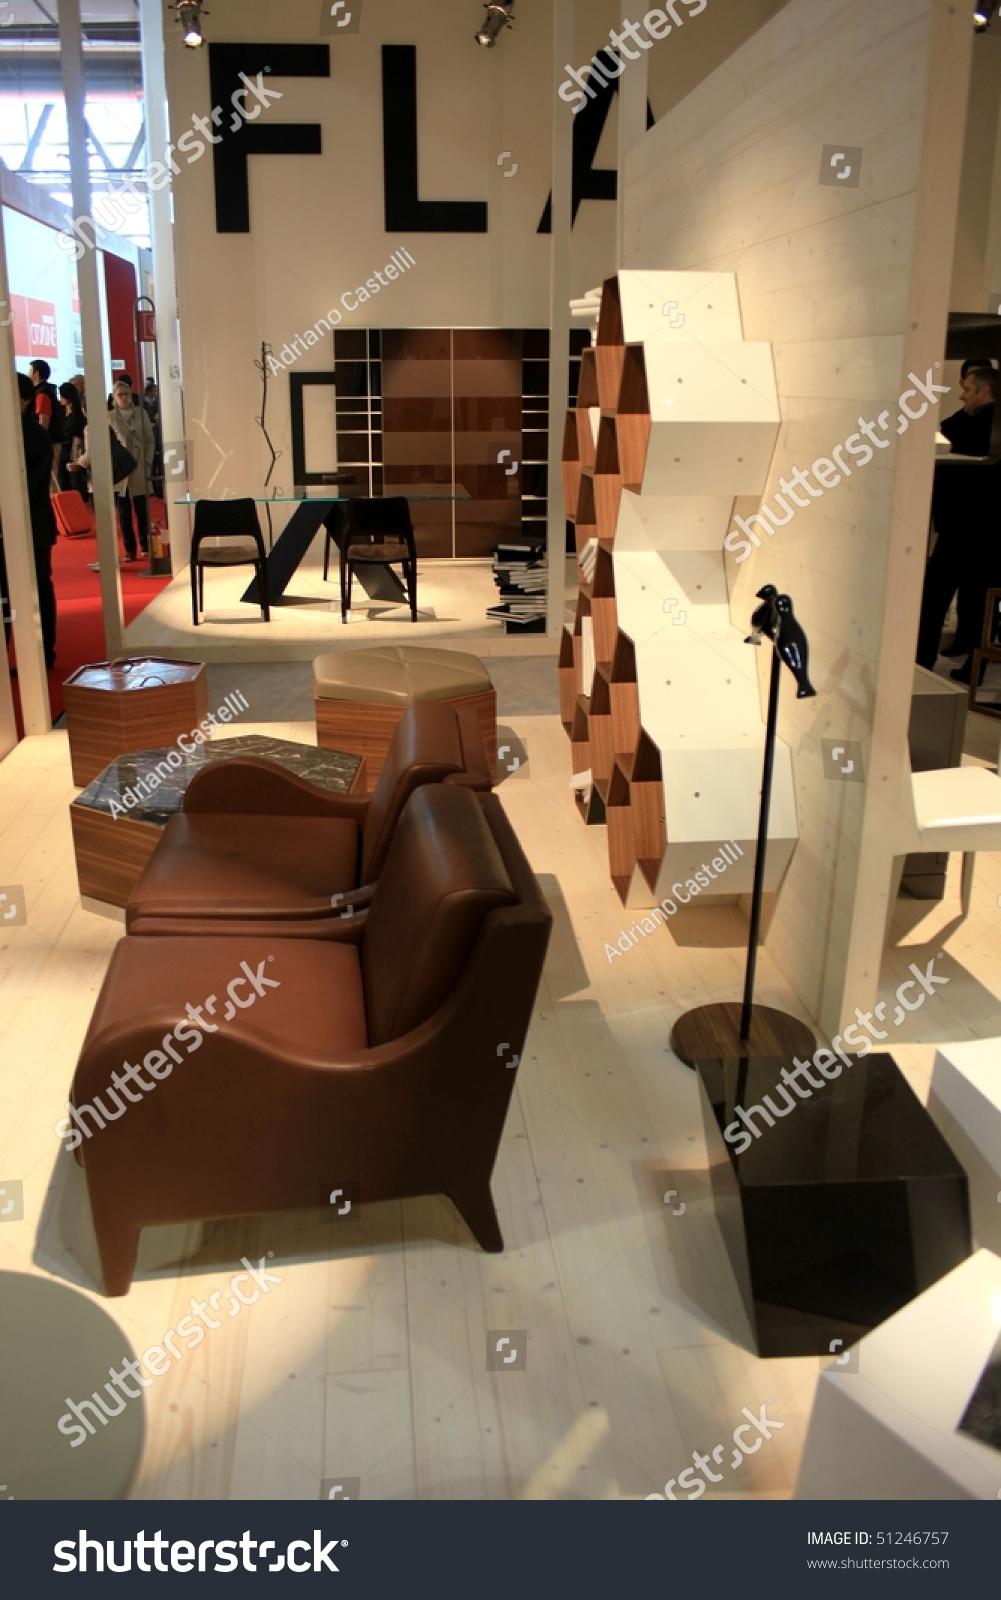 Milan april 15 people visit interior design stands at salone del mobile international for International interior design exhibition